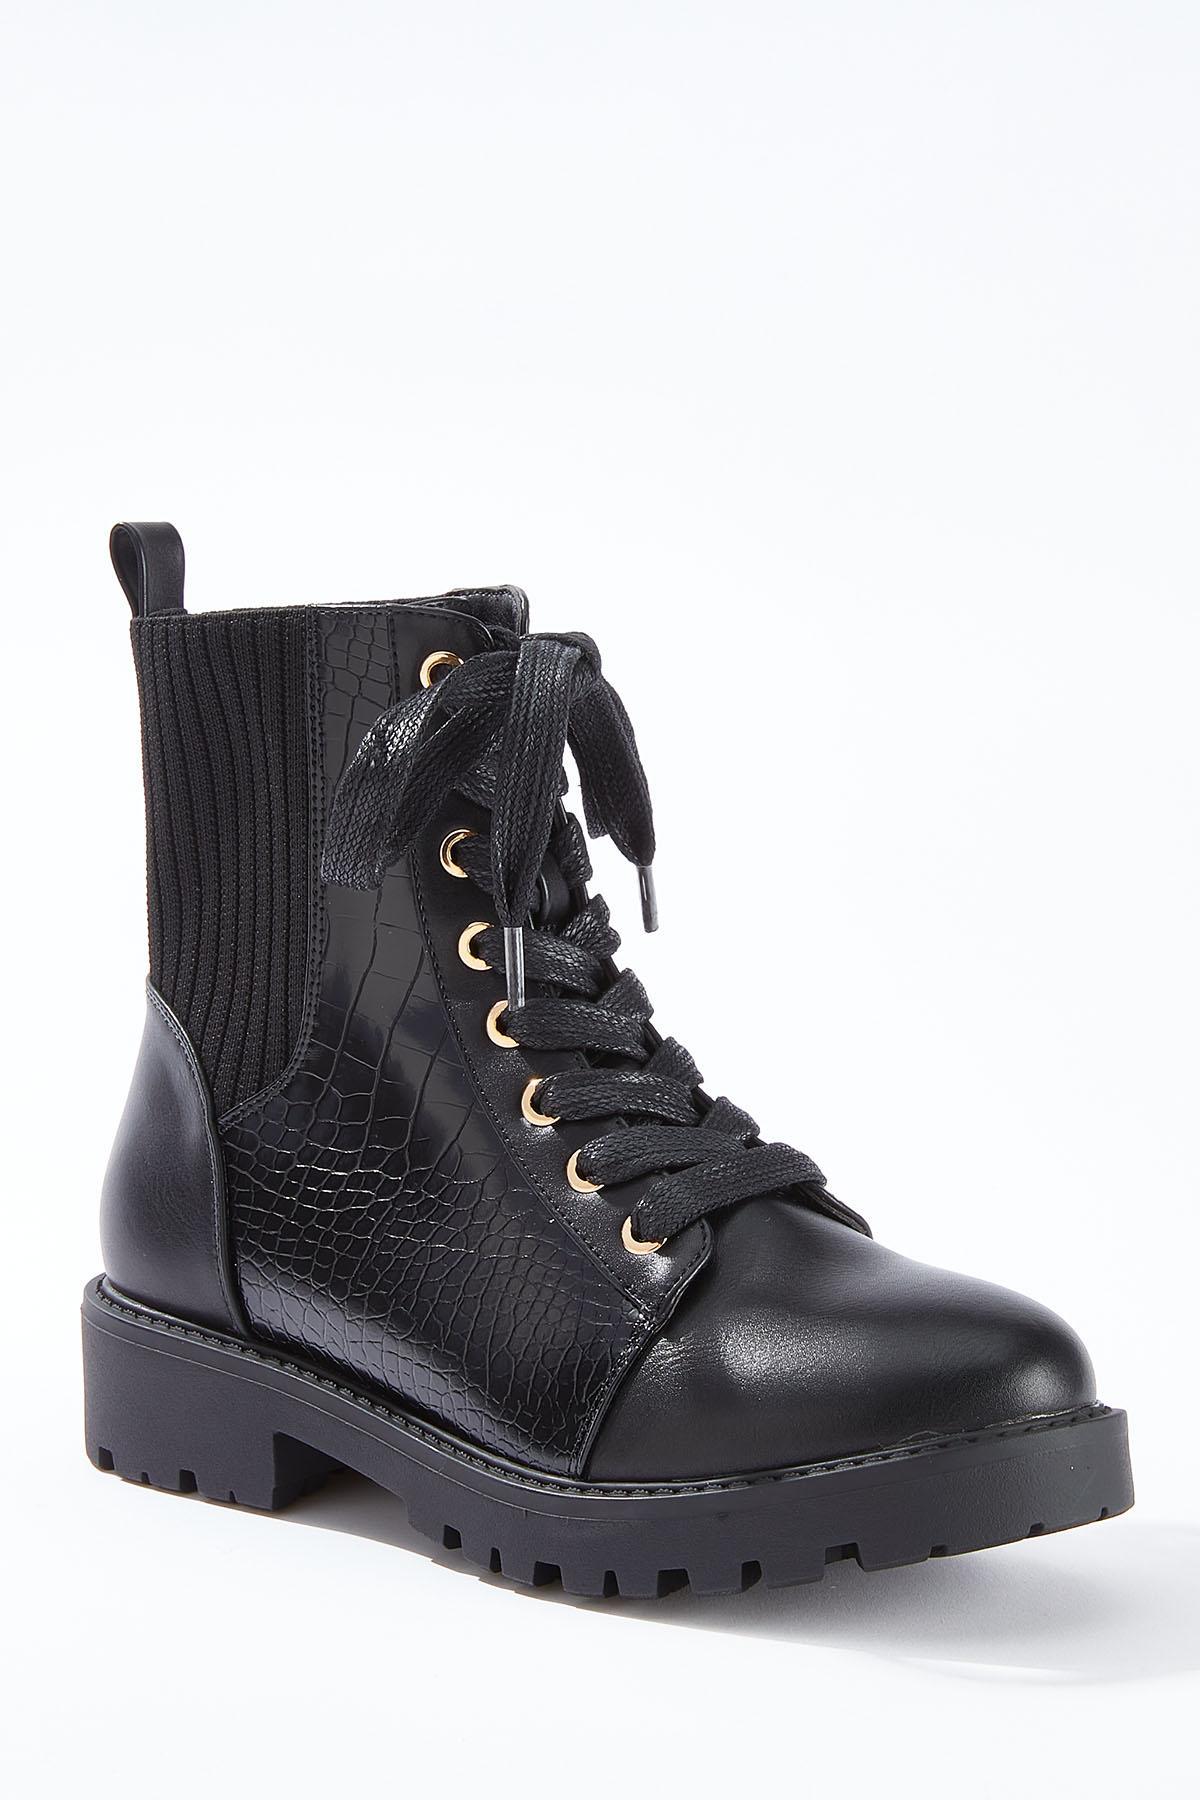 Wide Width Black Combat Boots